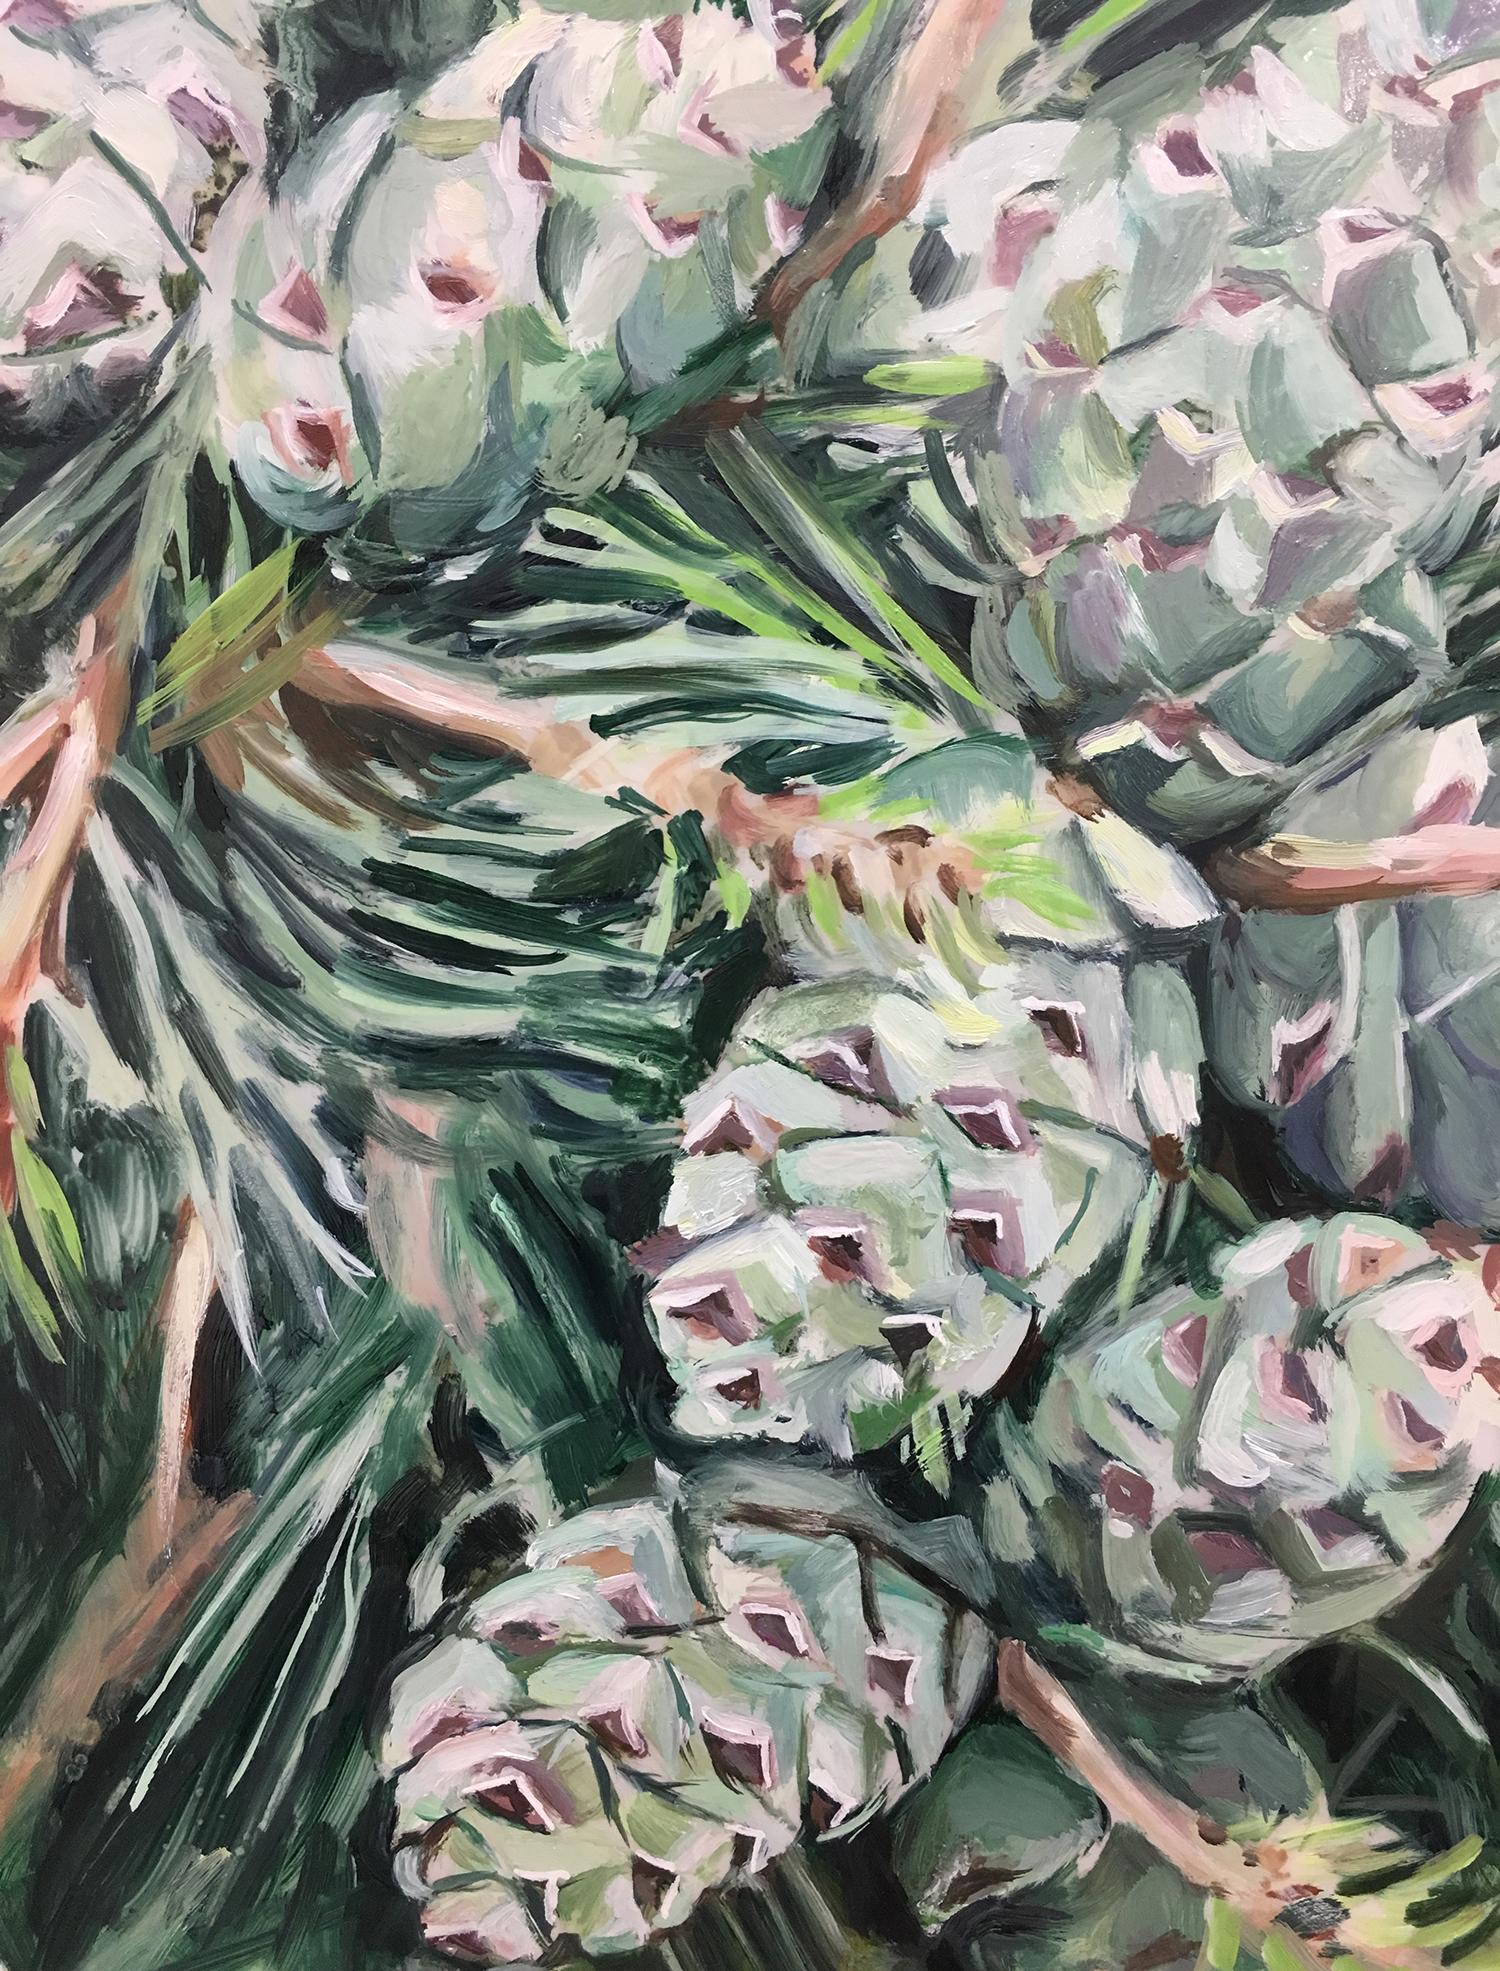 "Plants in Captivity No. 10 | Oil on Duralar | 11 x 14"" L"